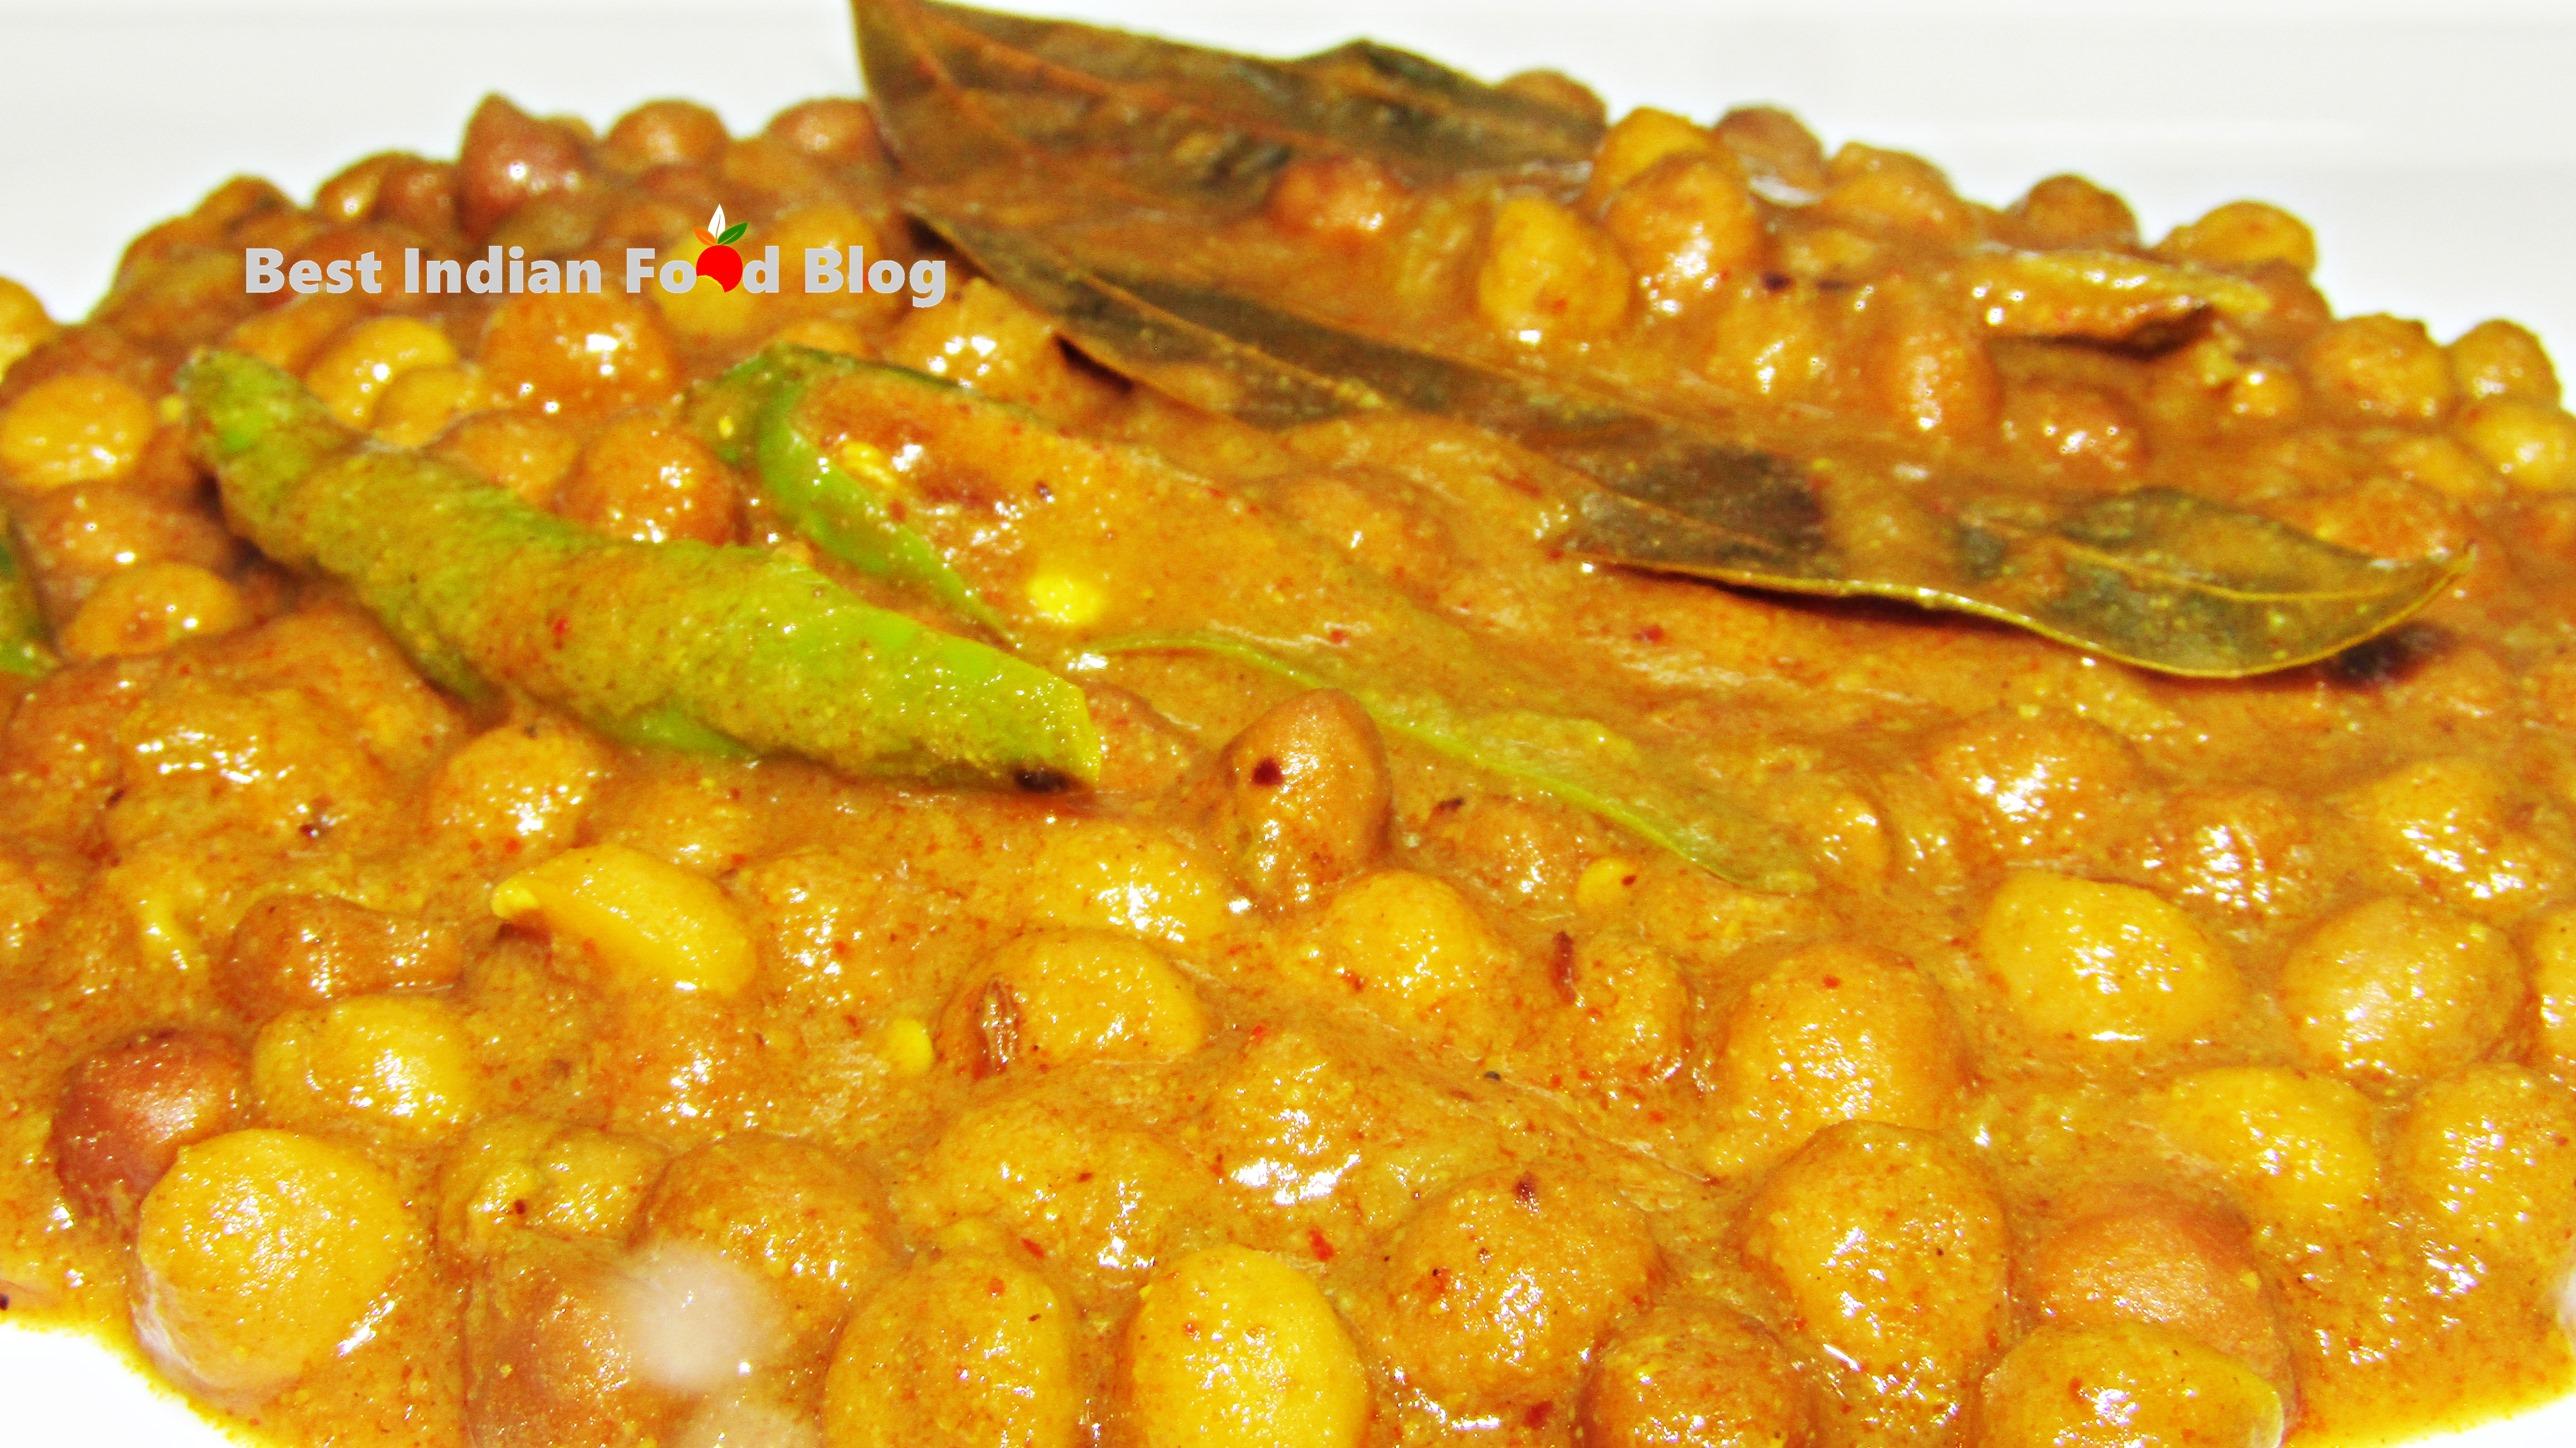 Kala Chana Khatta from Himachal Pradesh, India | Best Indian Food Blog | Chickpea recipe